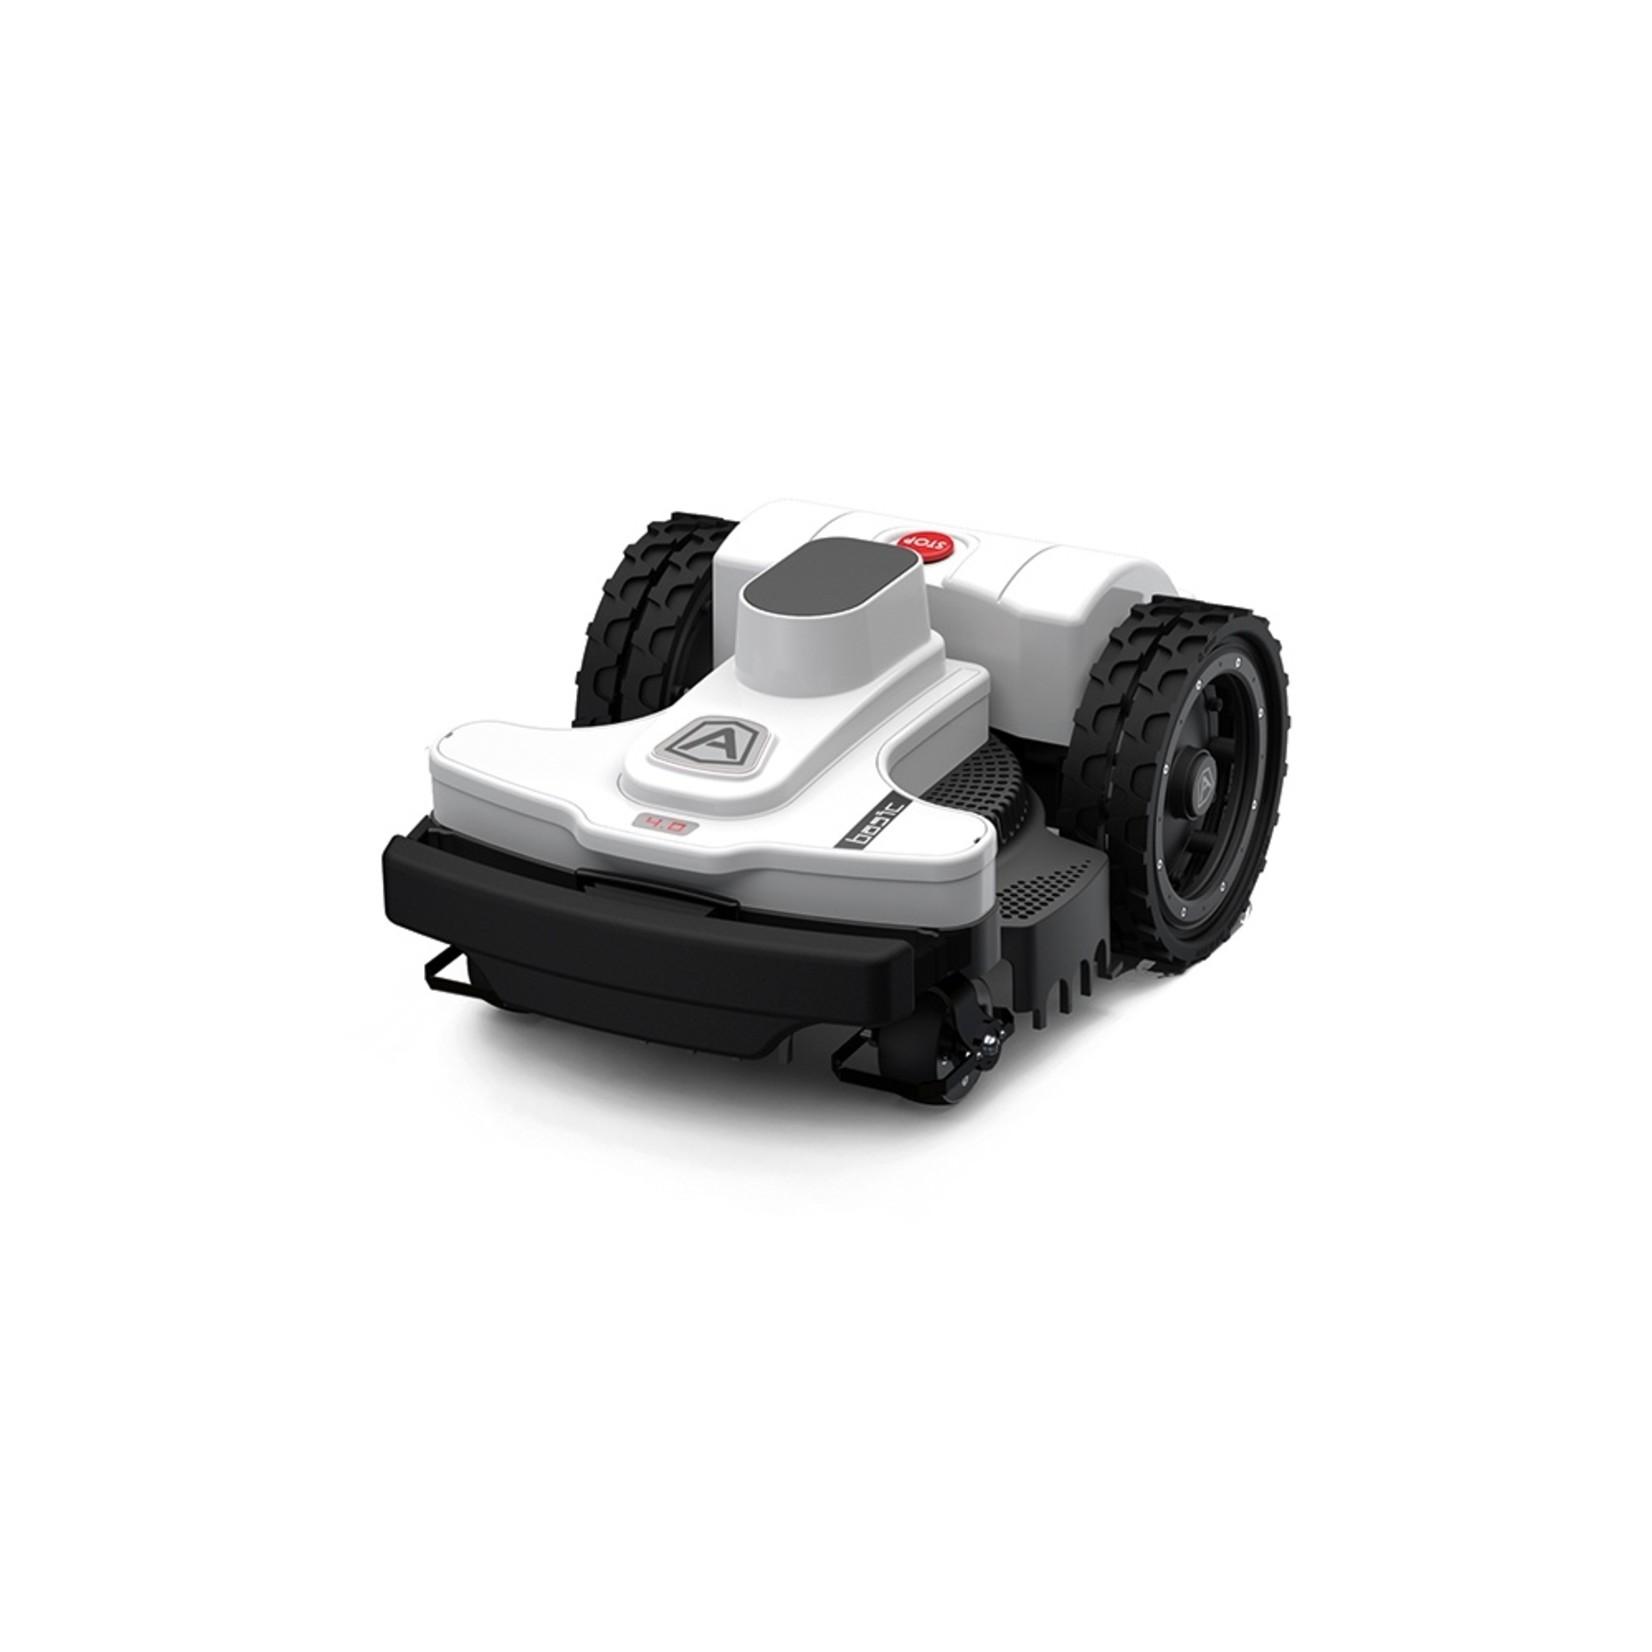 Ambrogio Ambrogio Nextline 4.0 Basic Rasenmähroboter Modell 2021